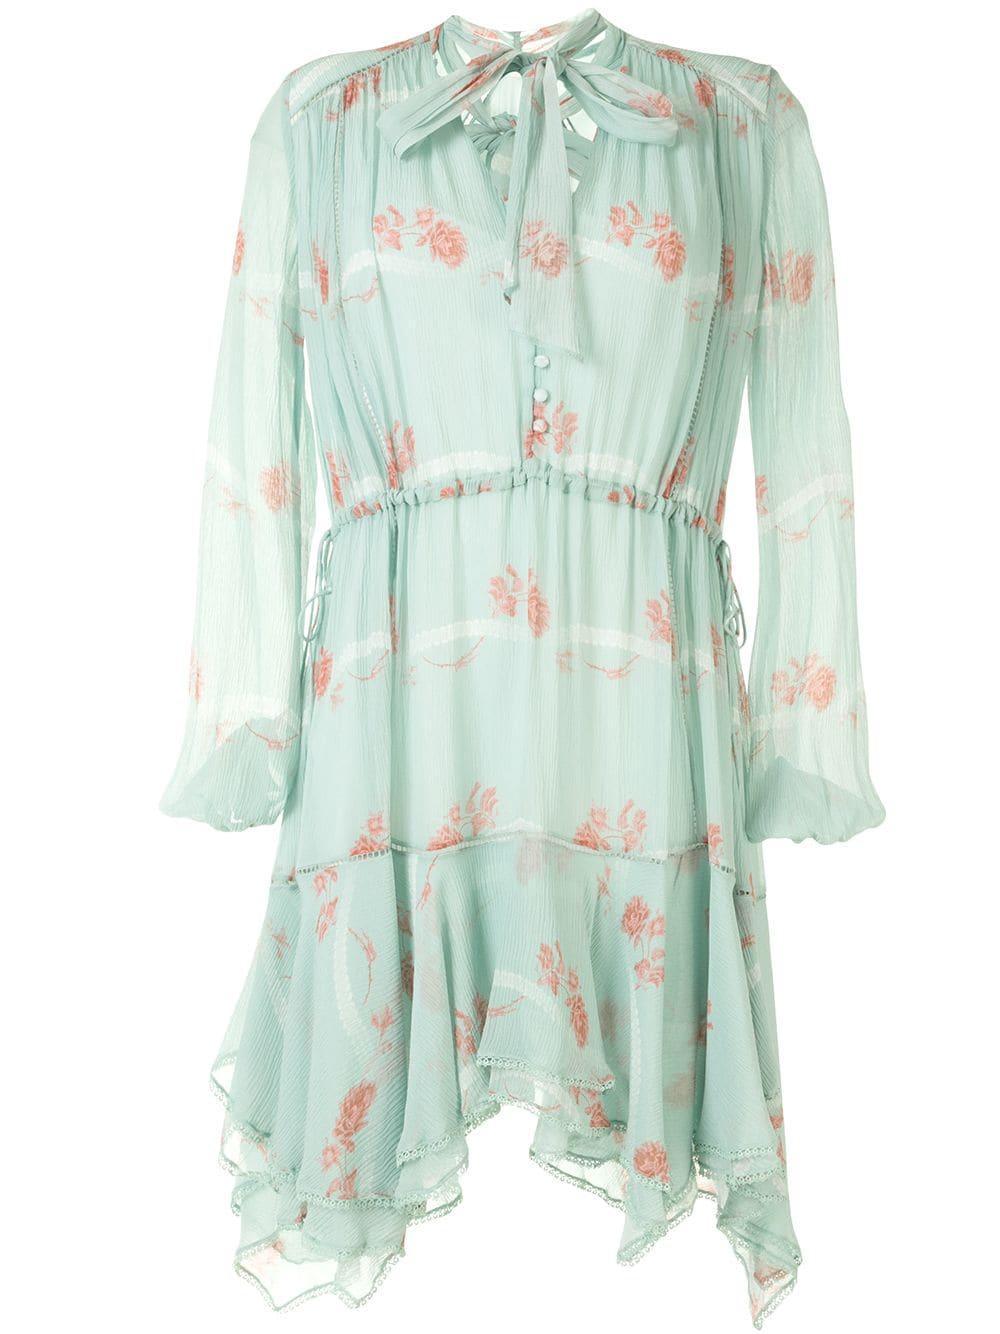 Irena Rose Silk Dress Item # 220-1130-U